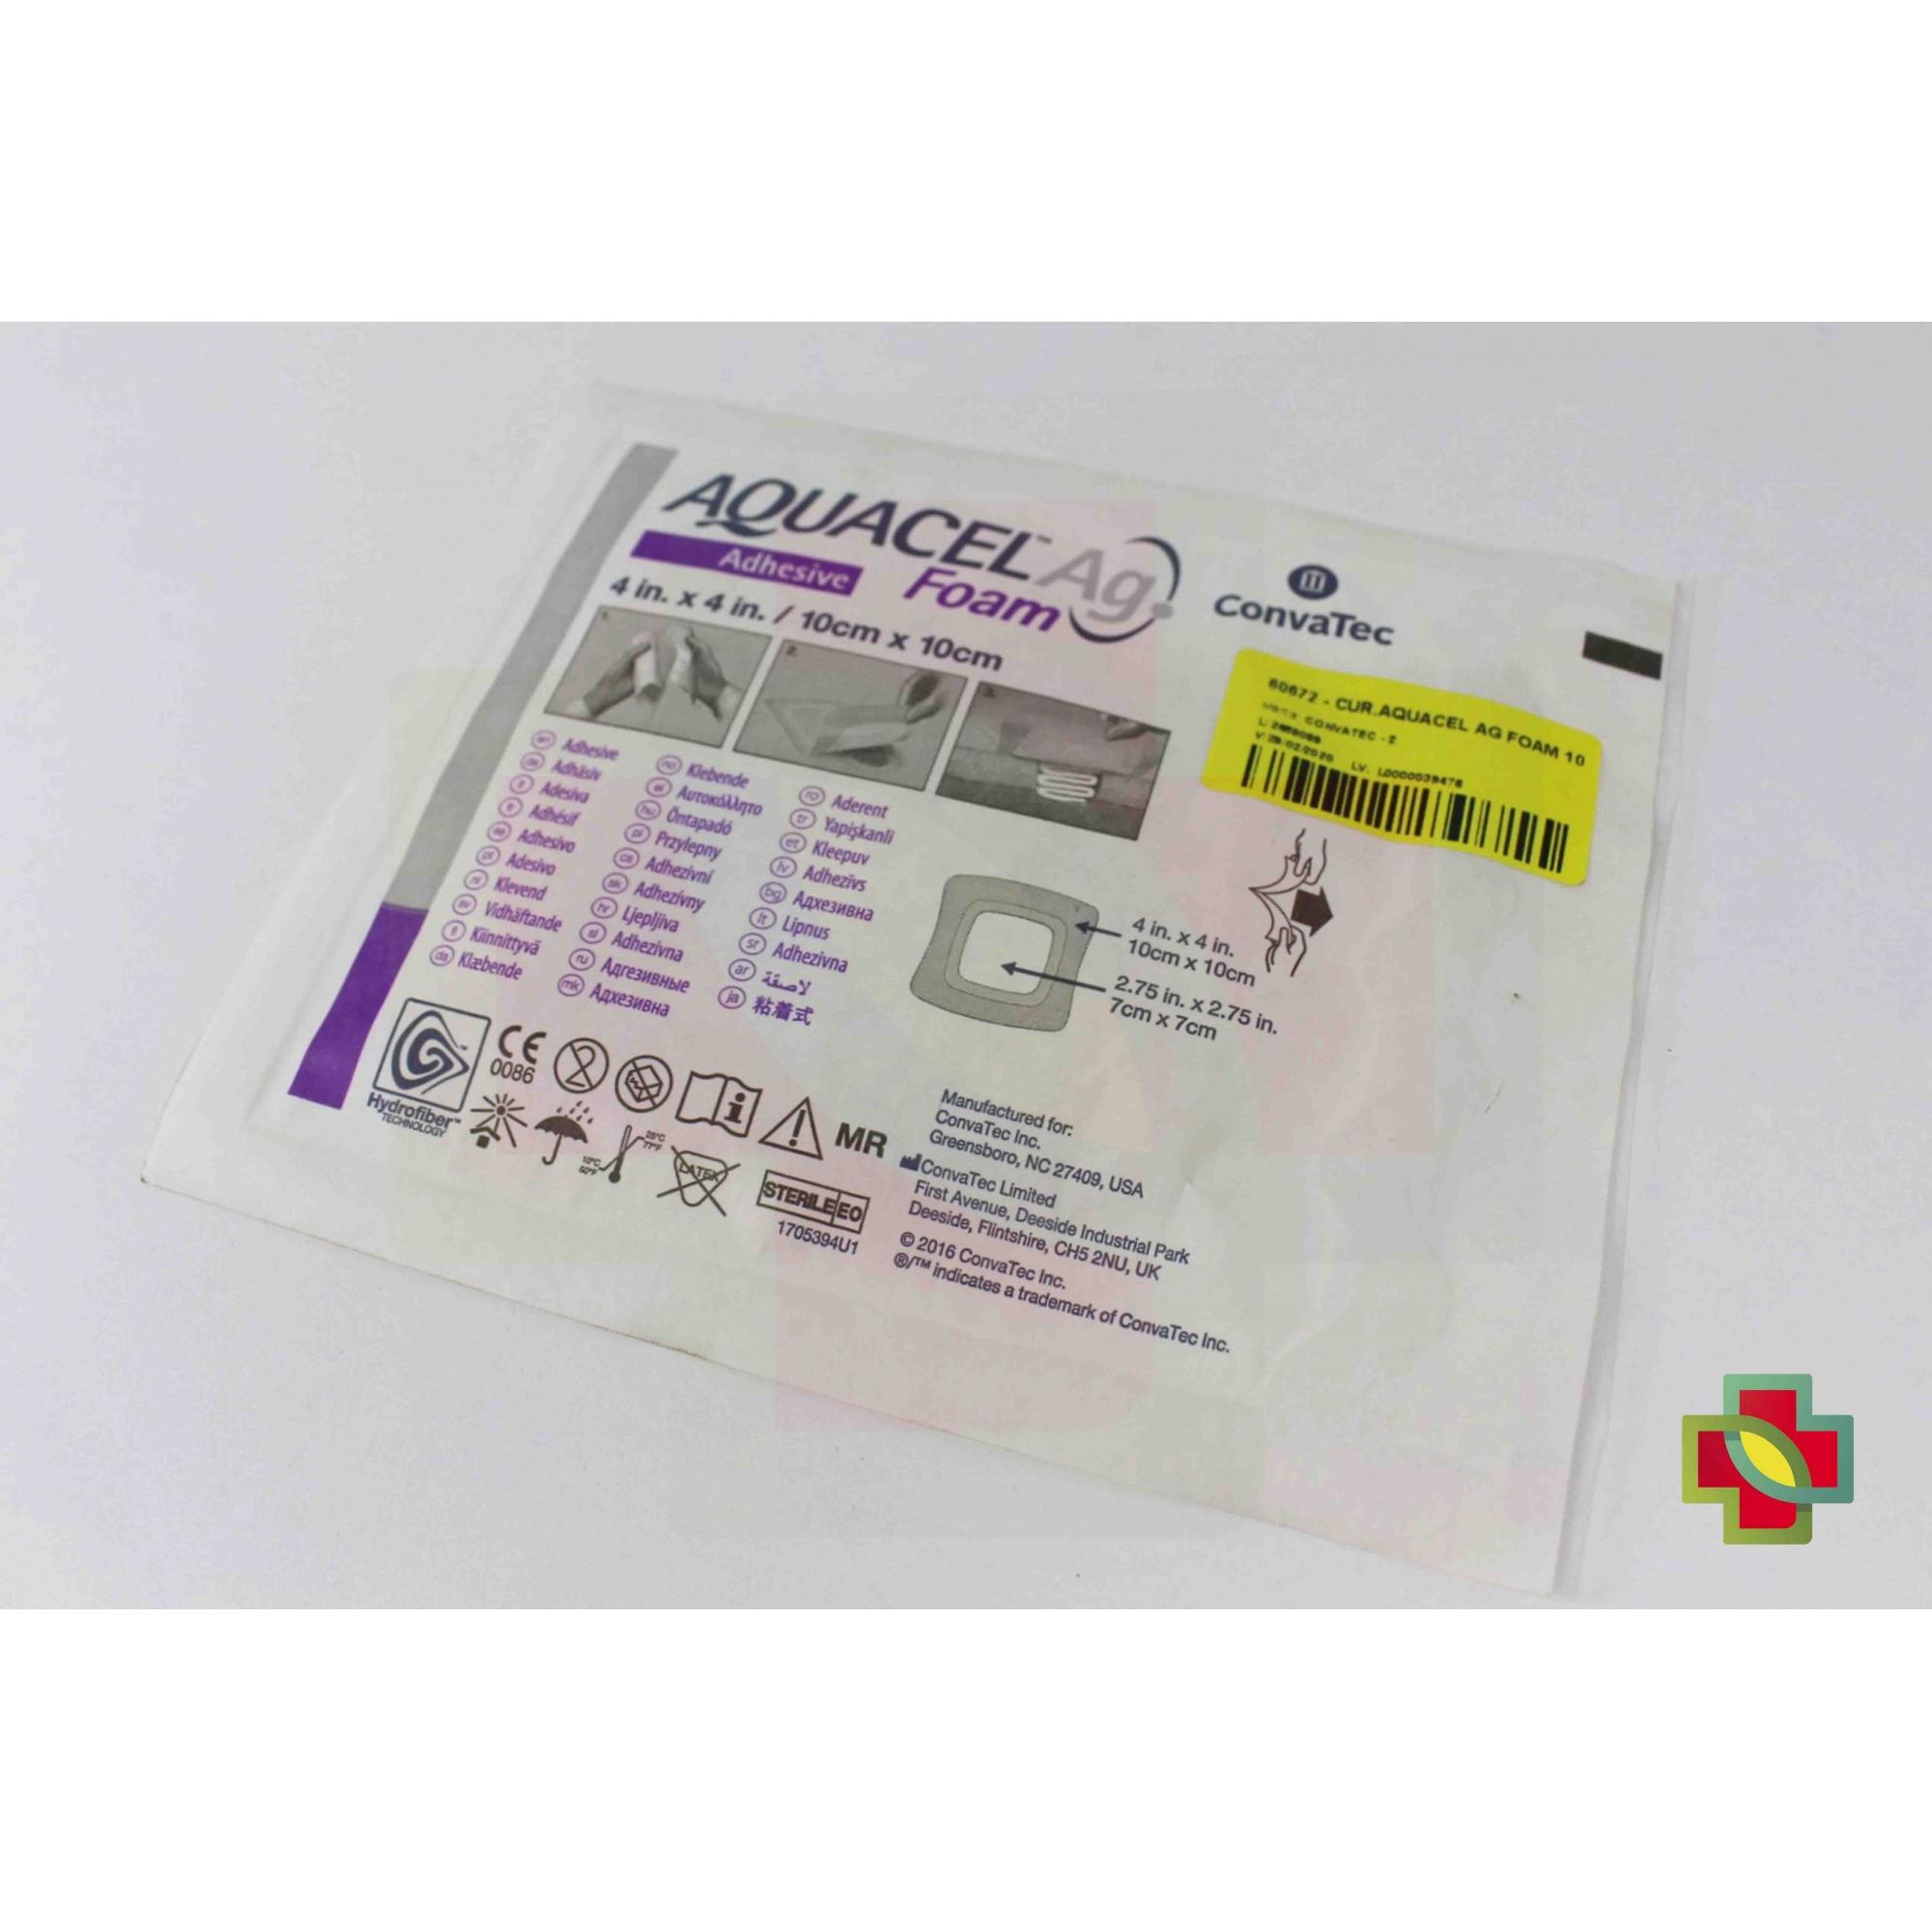 CURATIVO AQUACEL AG FOAM ADESIVO 10 X 10 UND 420681 CONVATEC